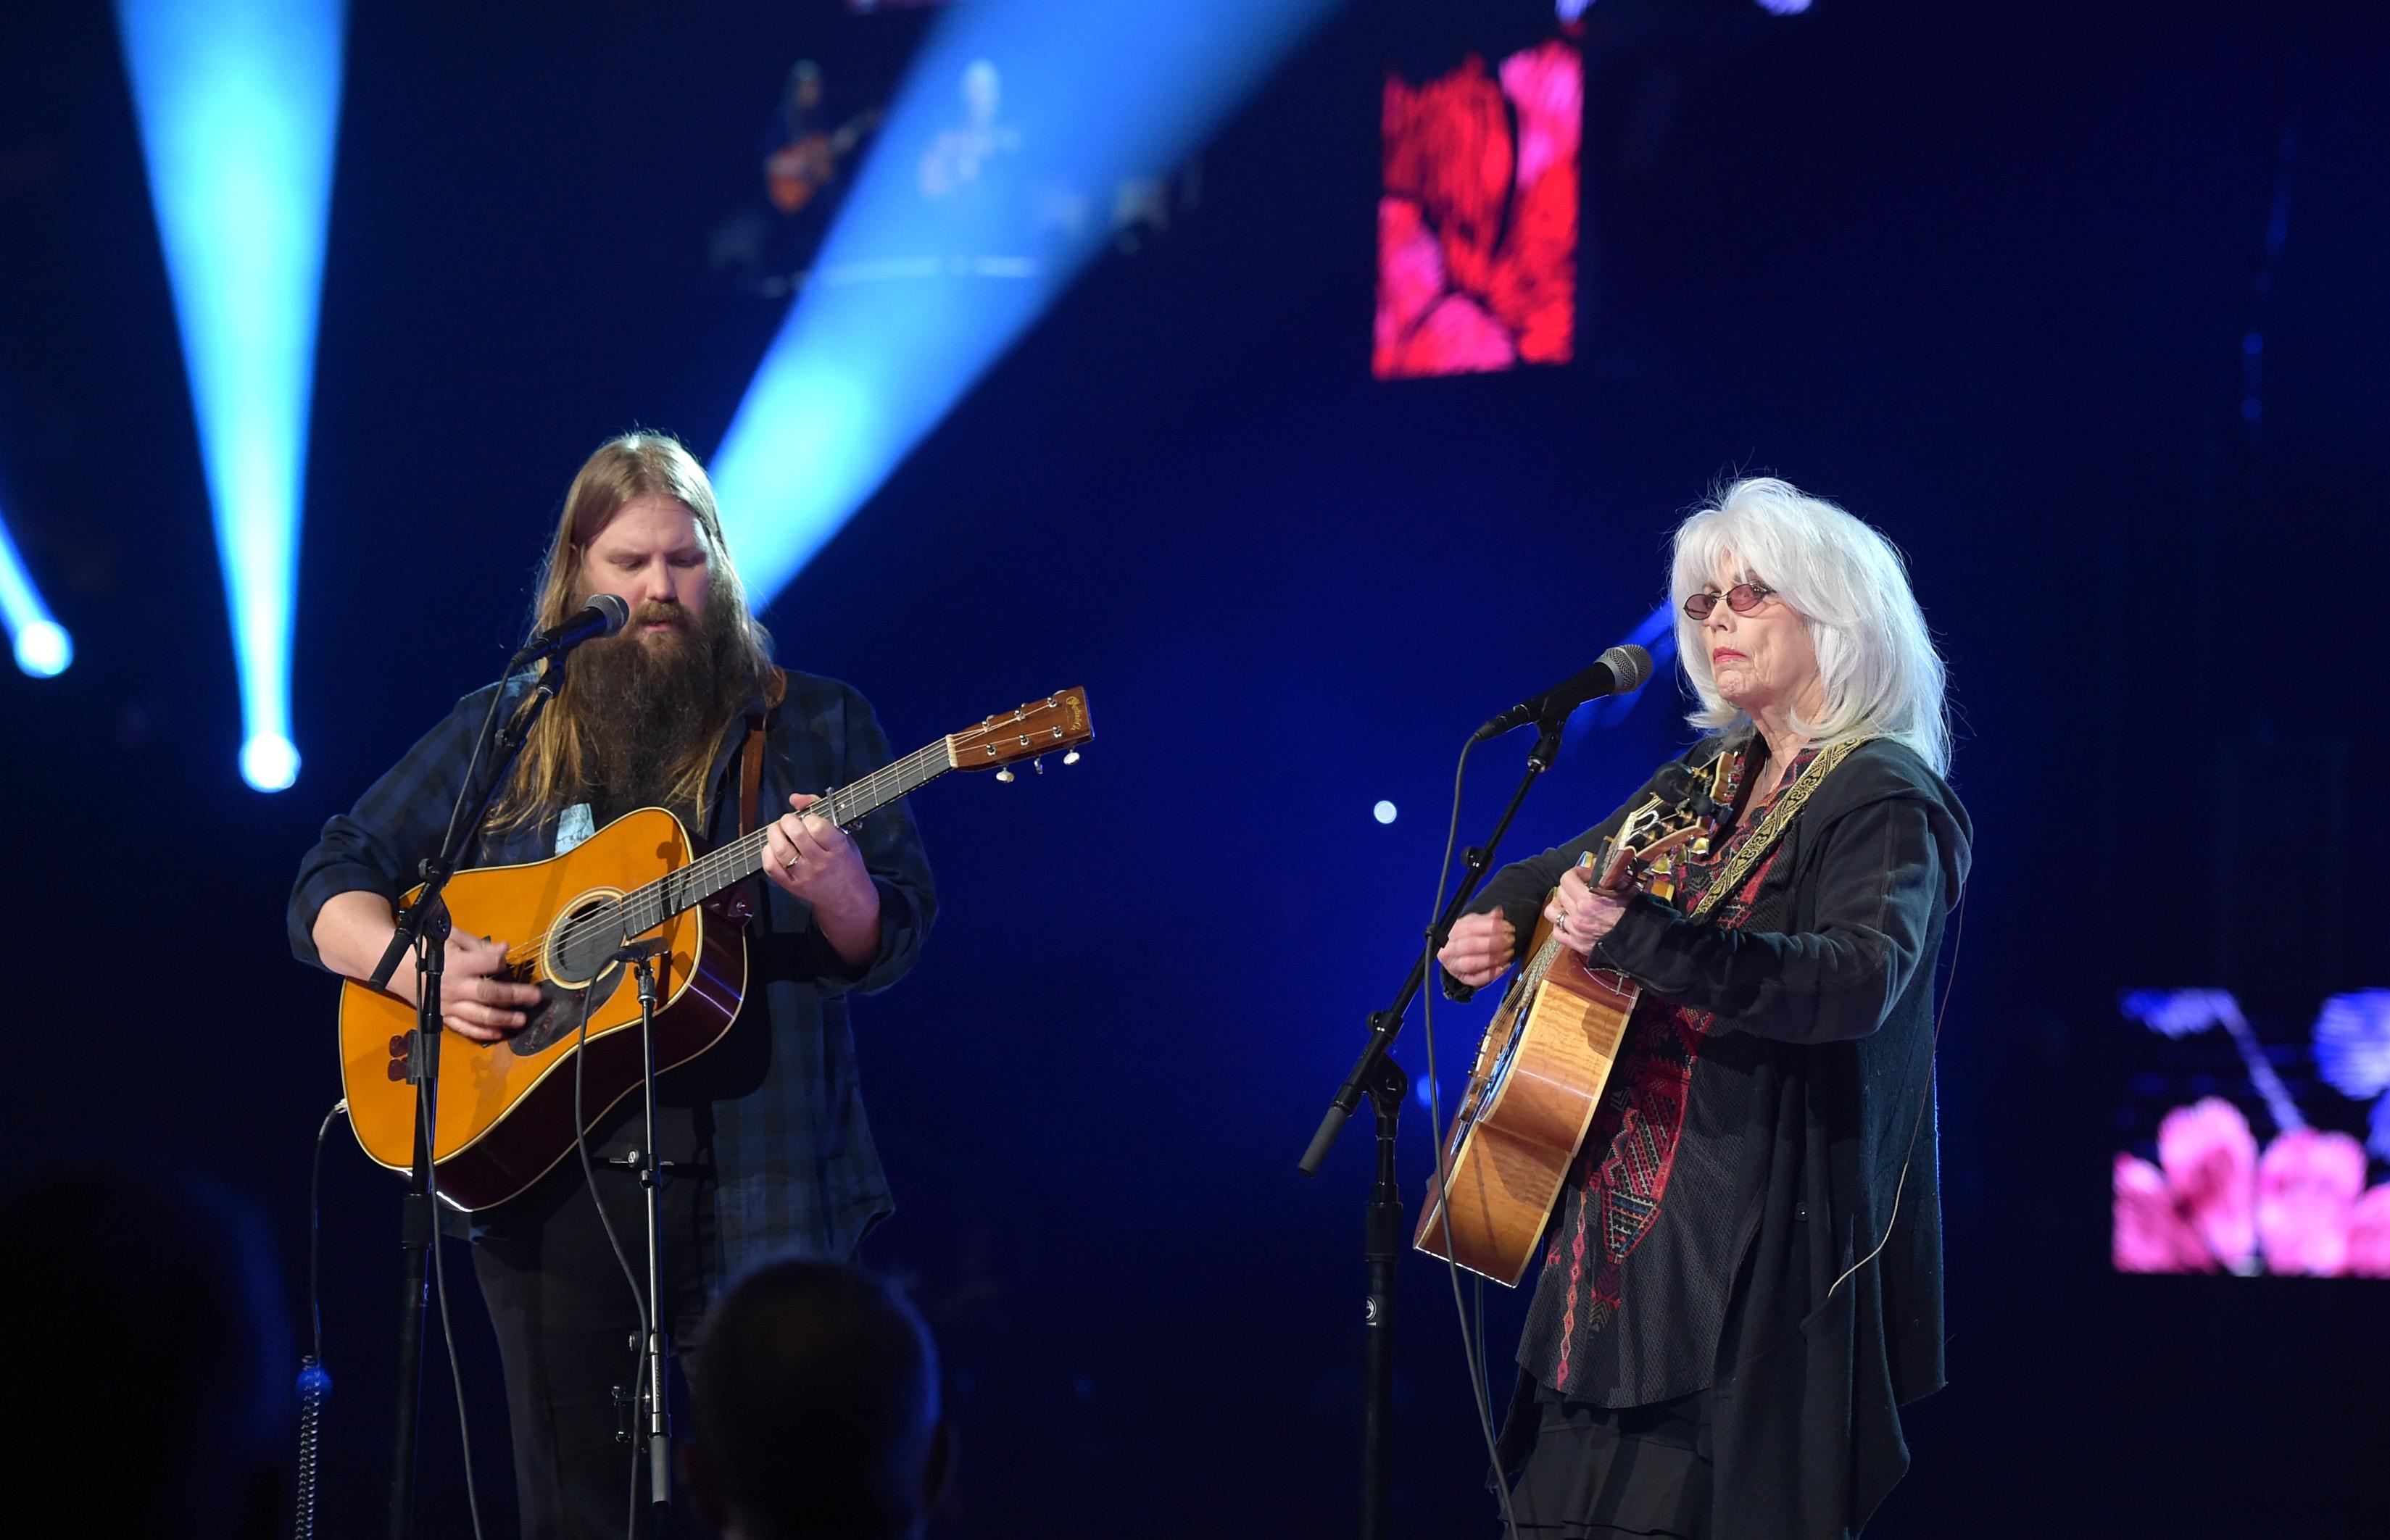 Grammys 2018: Watch Chris Stapleton & Emmylou Harris Cover Tom Petty